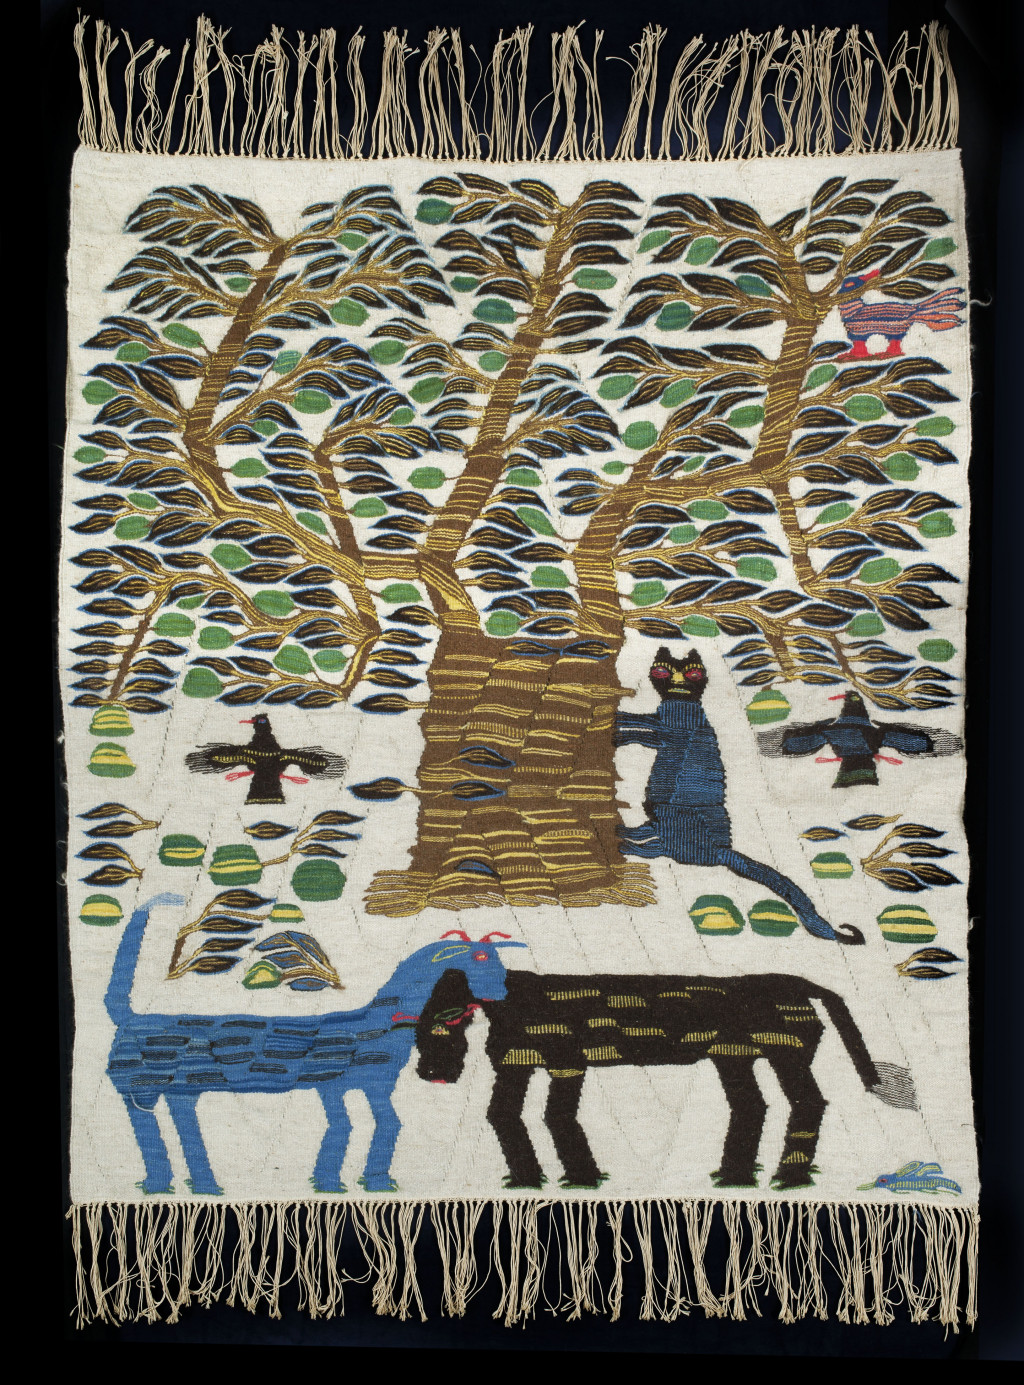 Rawhia Aly, L'arbre et le chat, 1961. Collectie Stedelijk Museum Amsterdam.